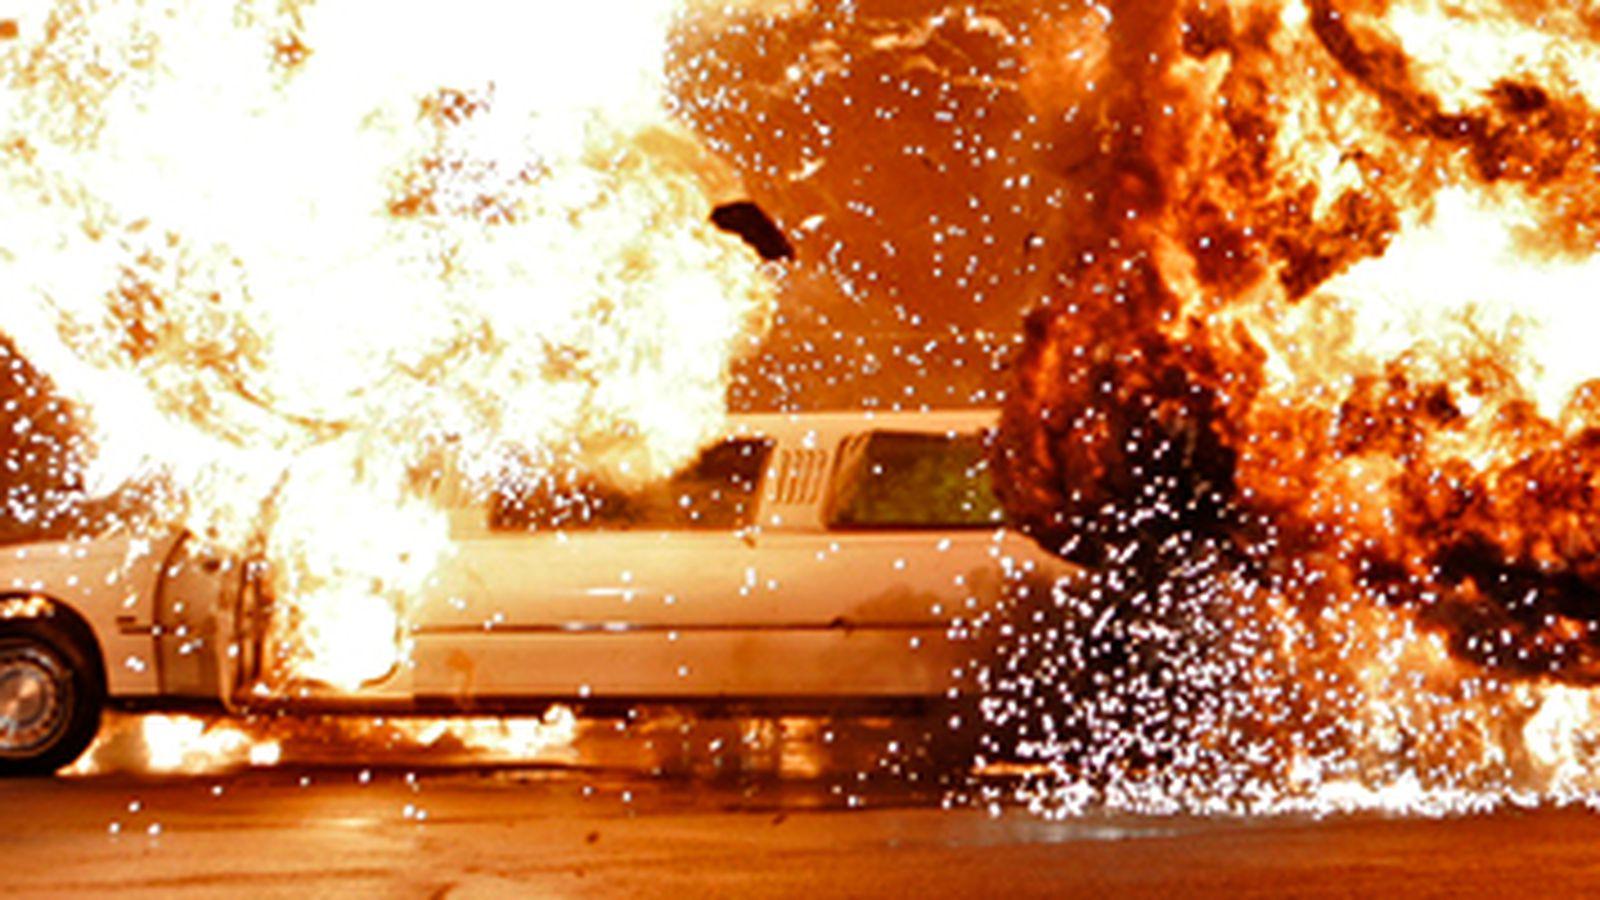 Vince McMahon Limo Explosion